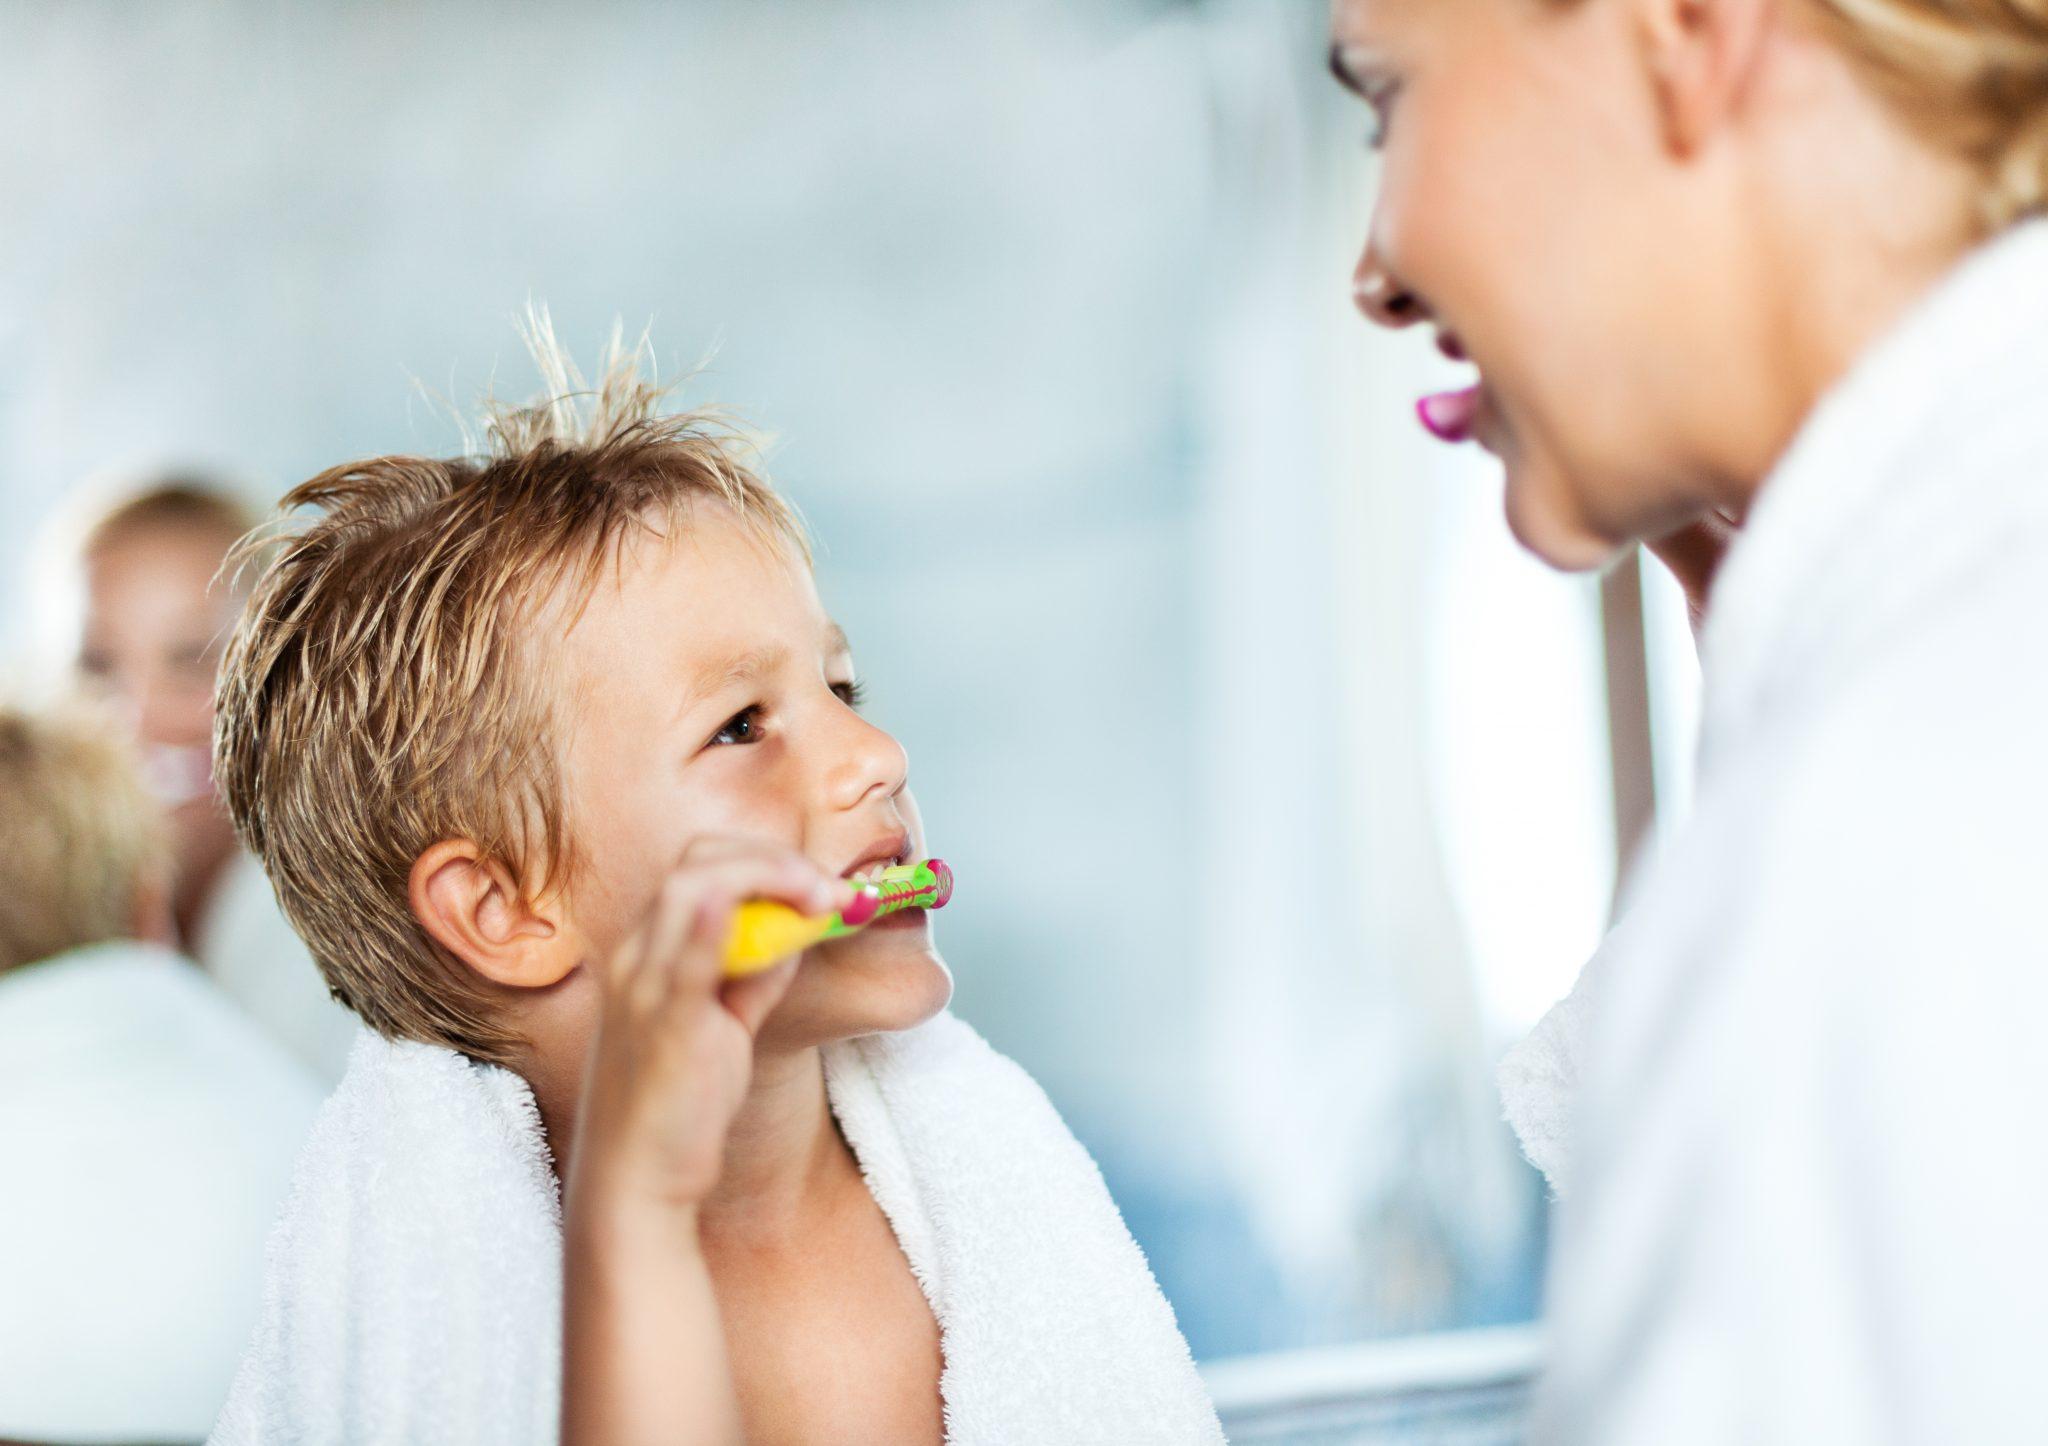 пленка картинка семья чистит зубы пожалуйстааа